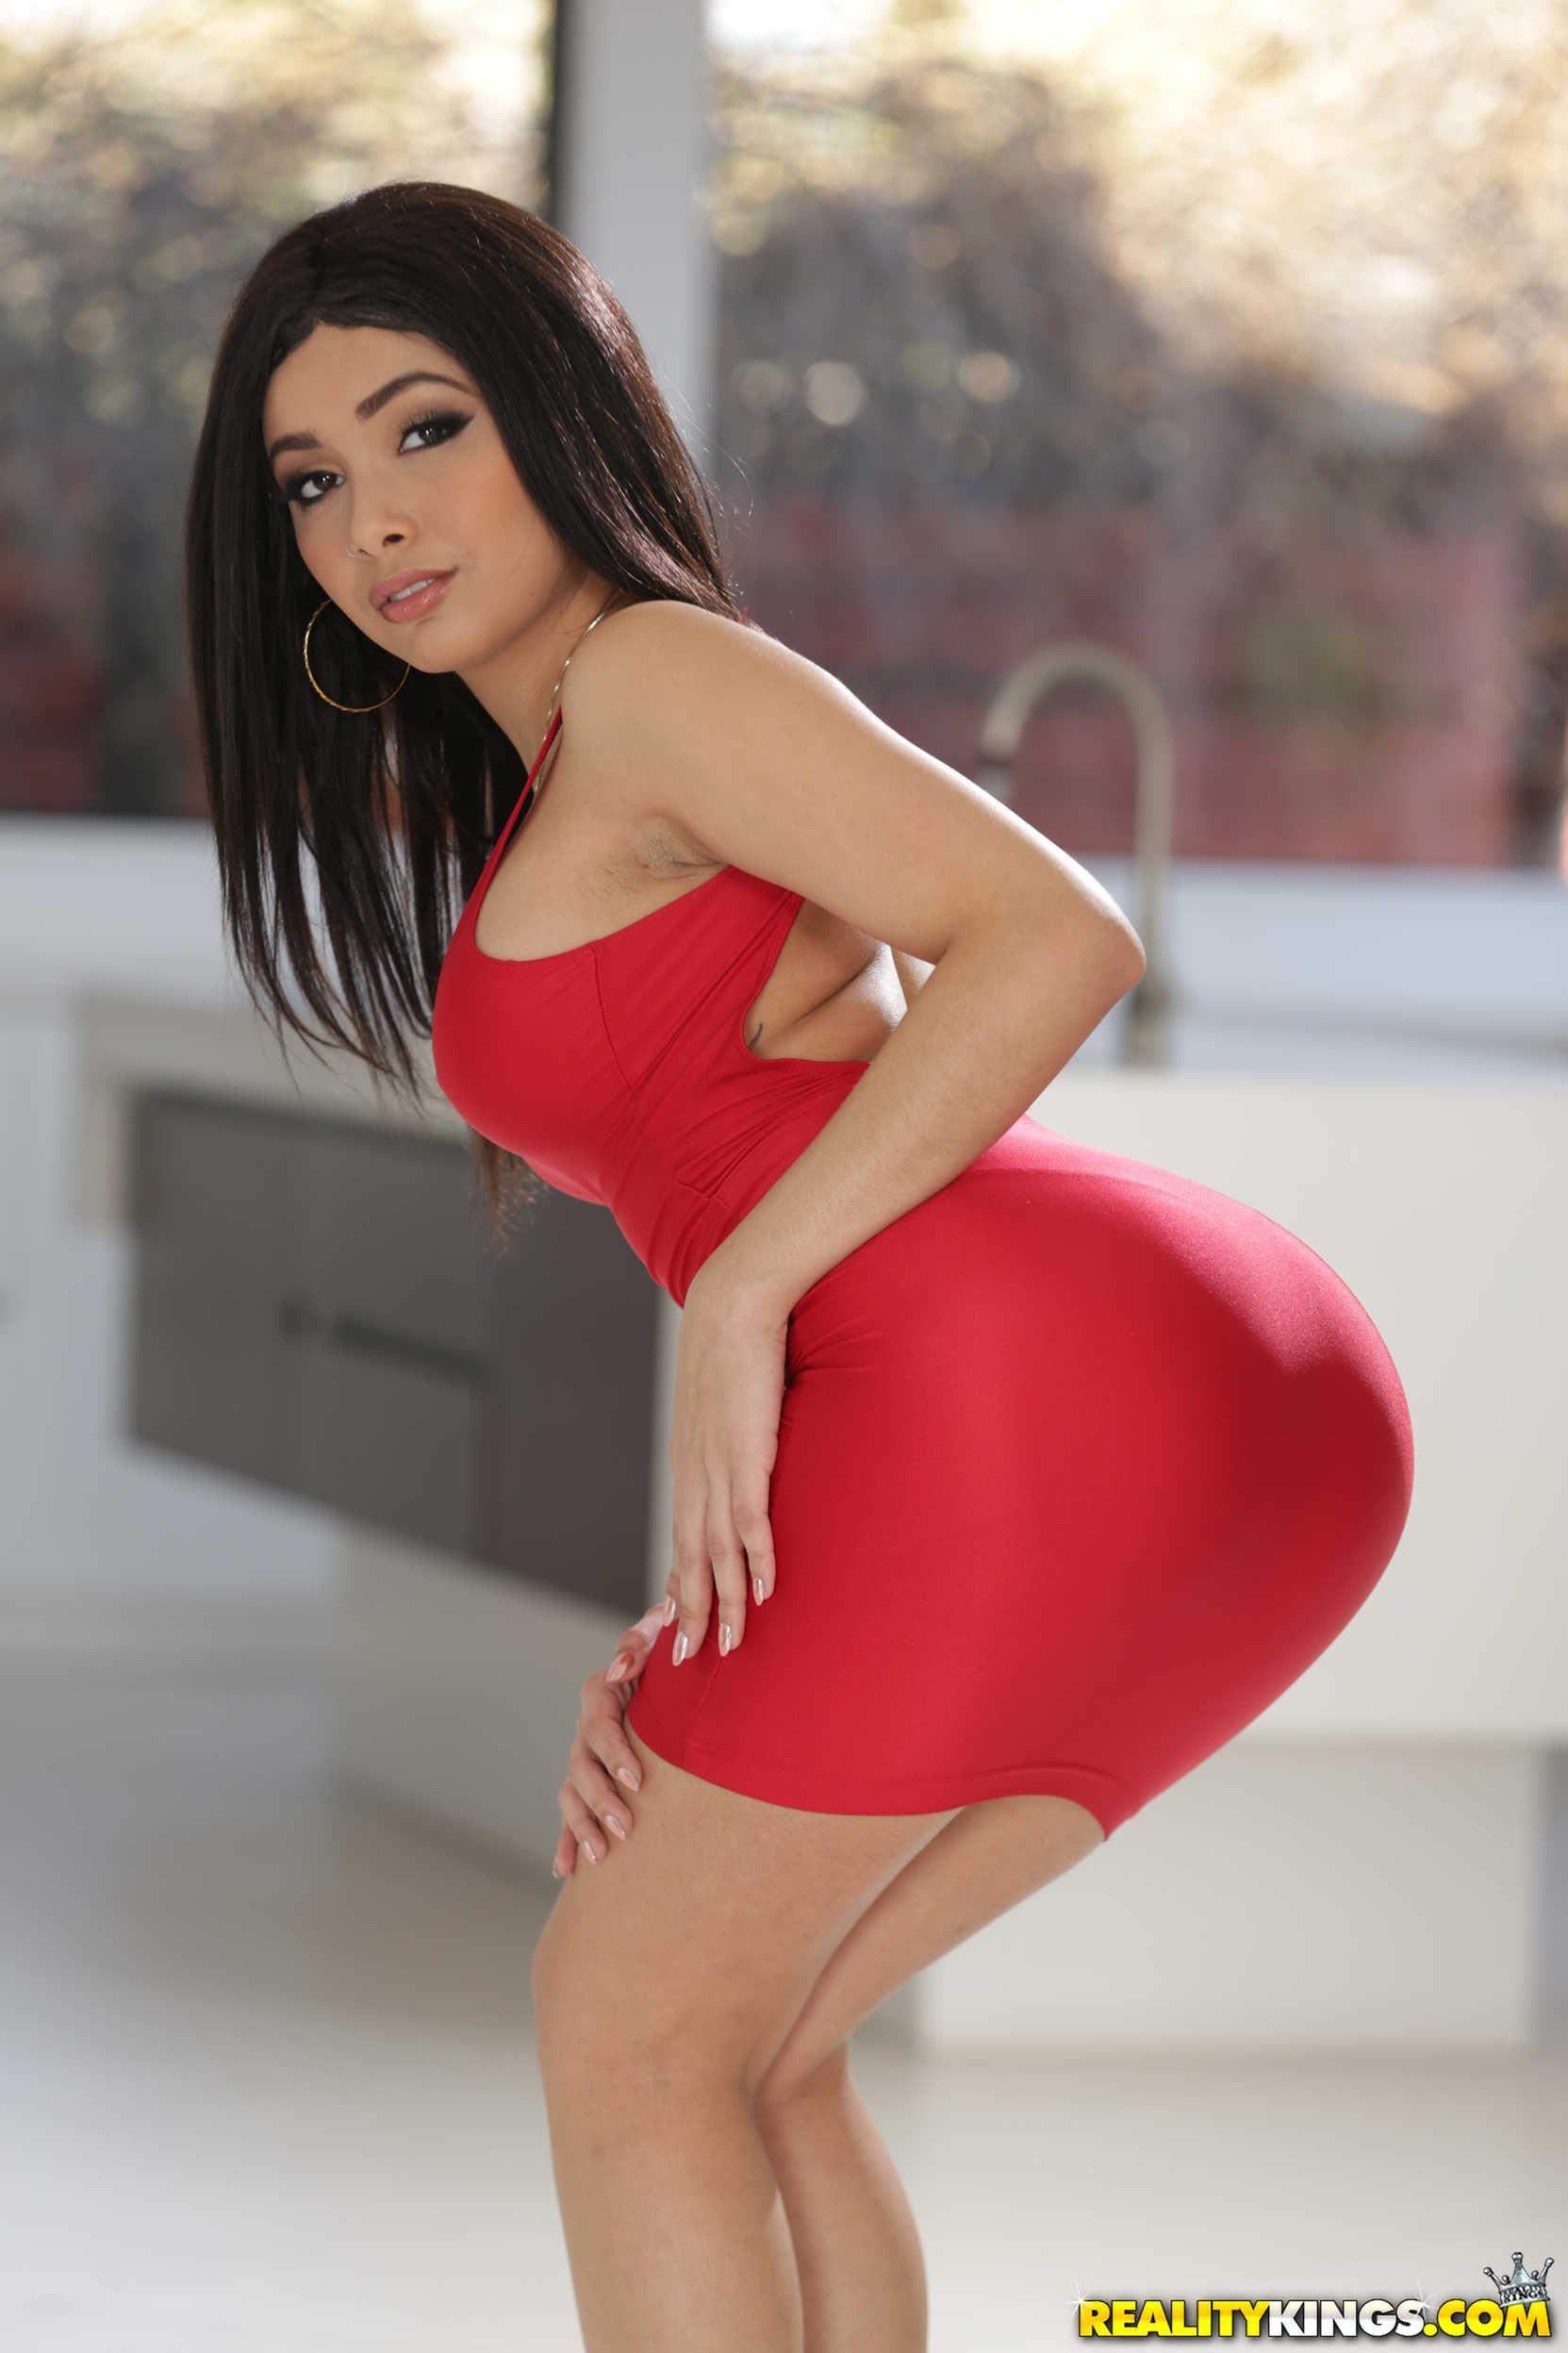 Aaliyah hadid in red dress gets fucked 6